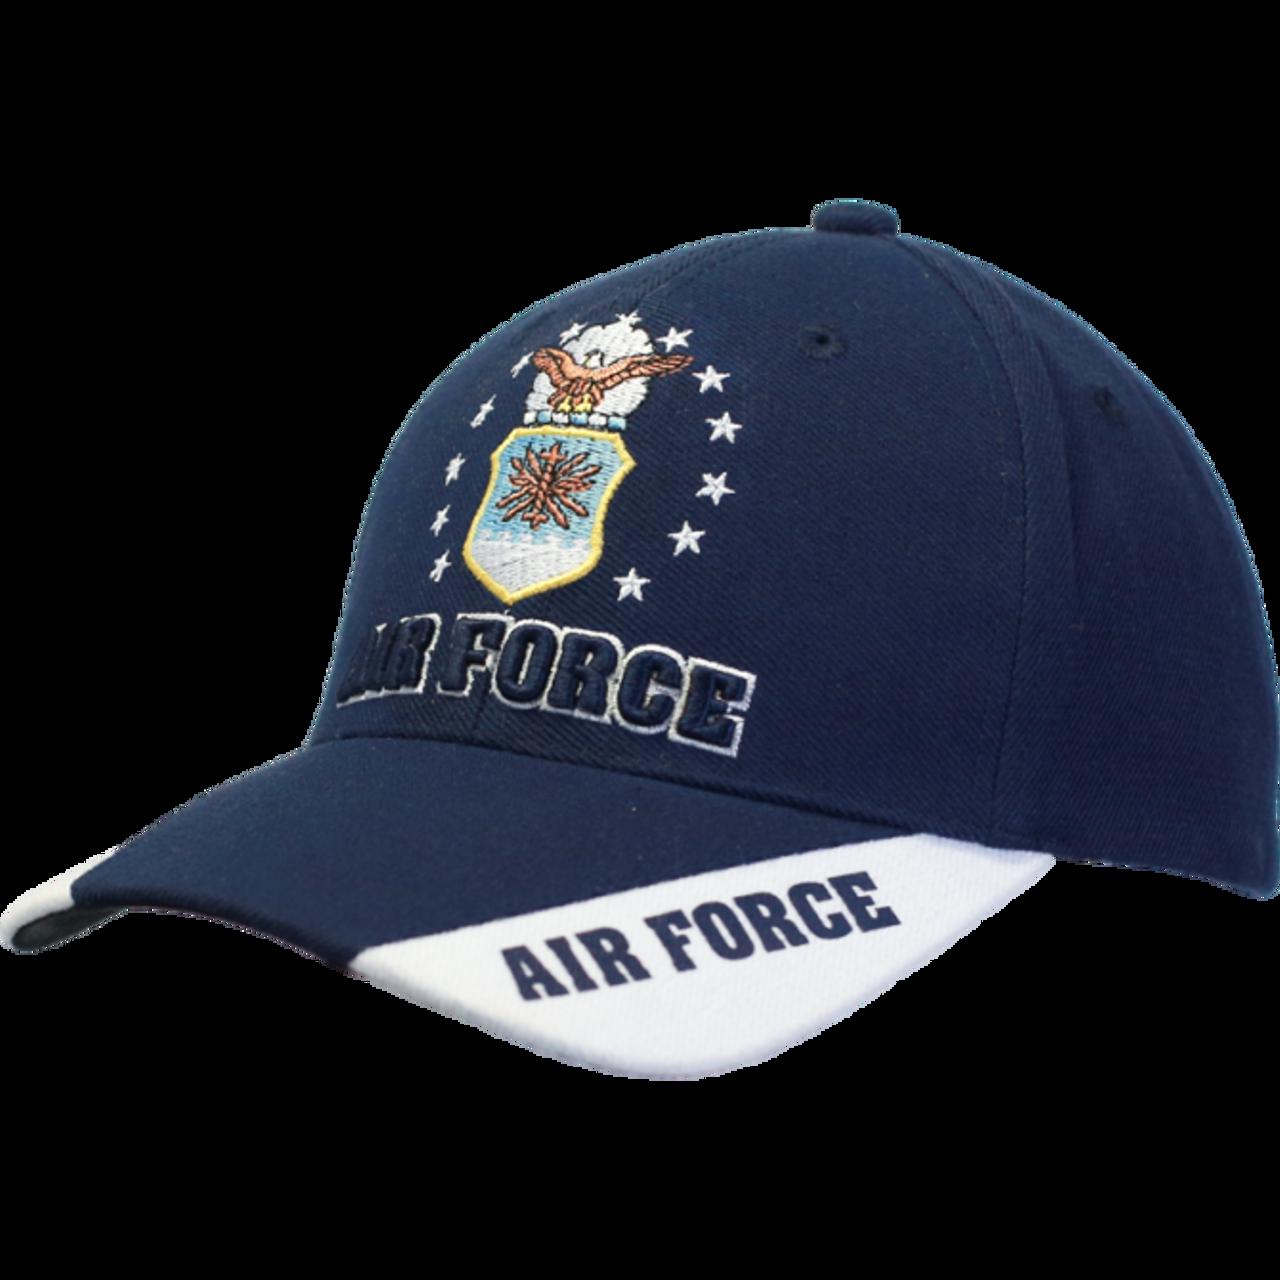 36e4d6e2fbe ... 08579 - U.S. Air Force Caps - 3-Way Style - Dark Blue White ...